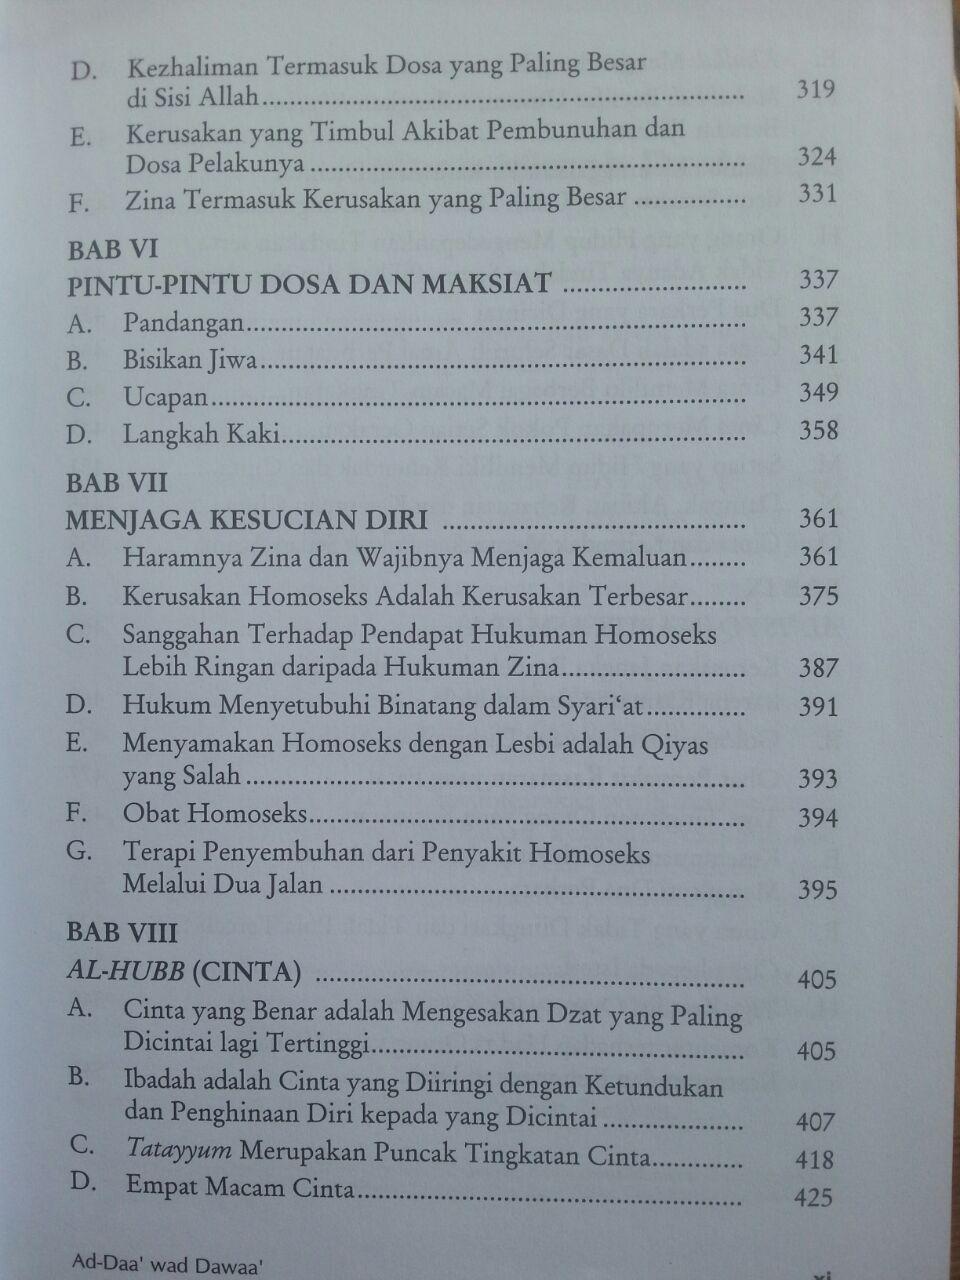 Buku Pengobatan Ad-Daa' wa ad-Dawaa' isi